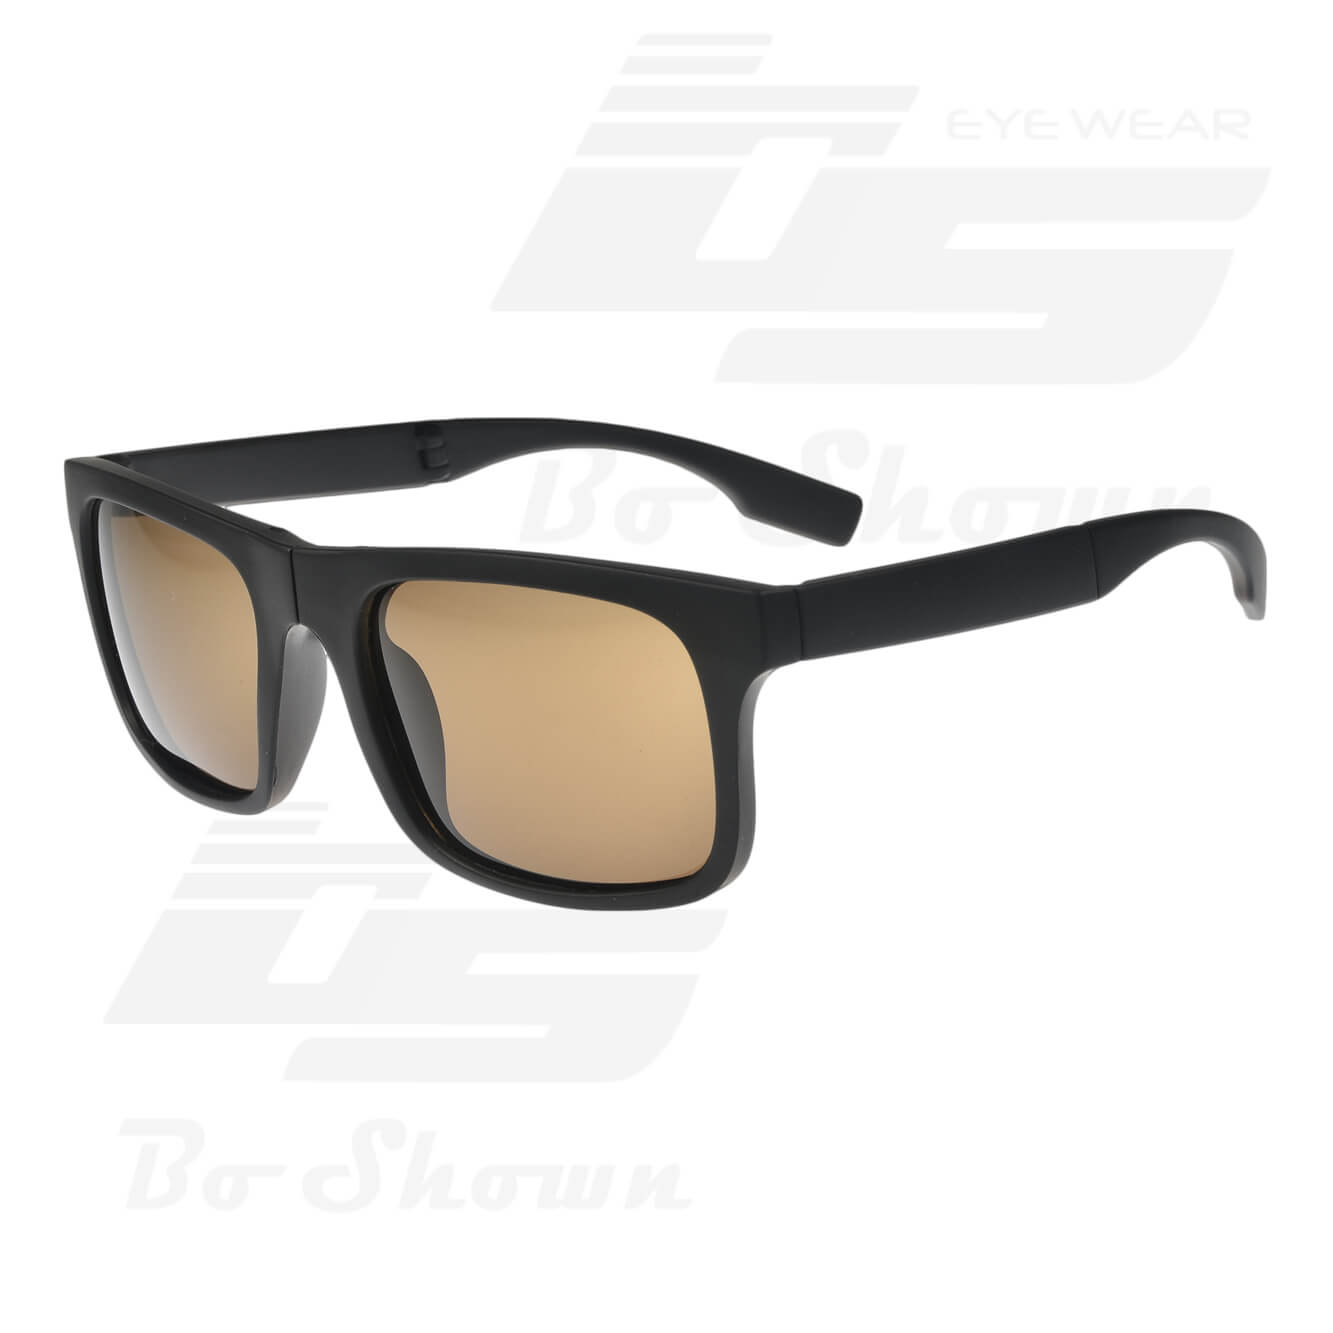 f78c6b4e749f4 Lifestyle Folding Sunglasses 236 - BO SHOWN EYEWEAR